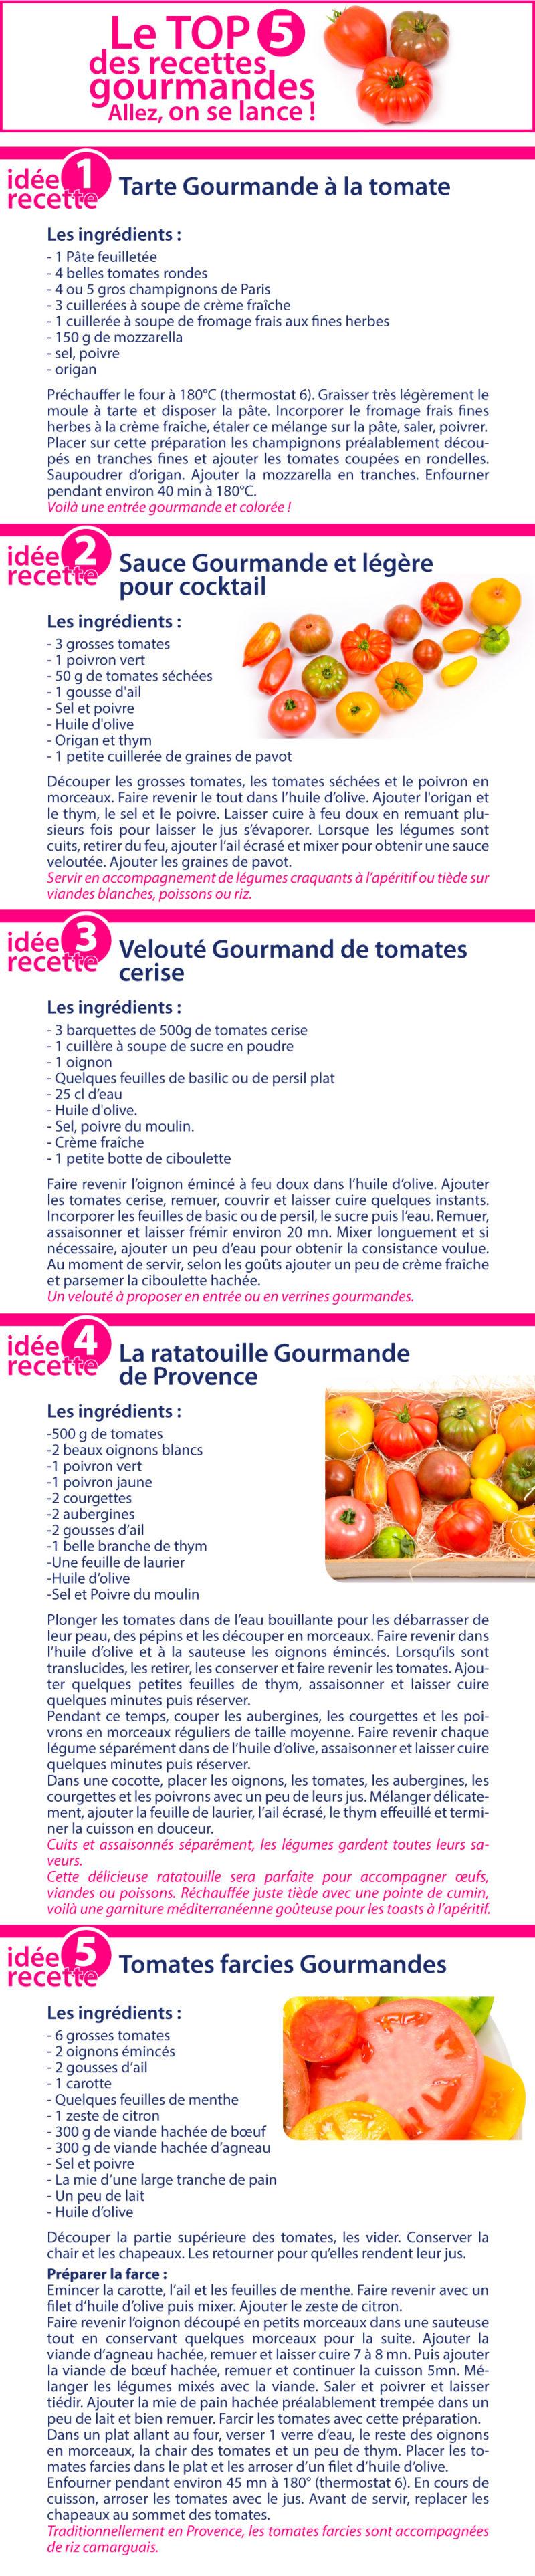 Top 5 recettes gourmandes